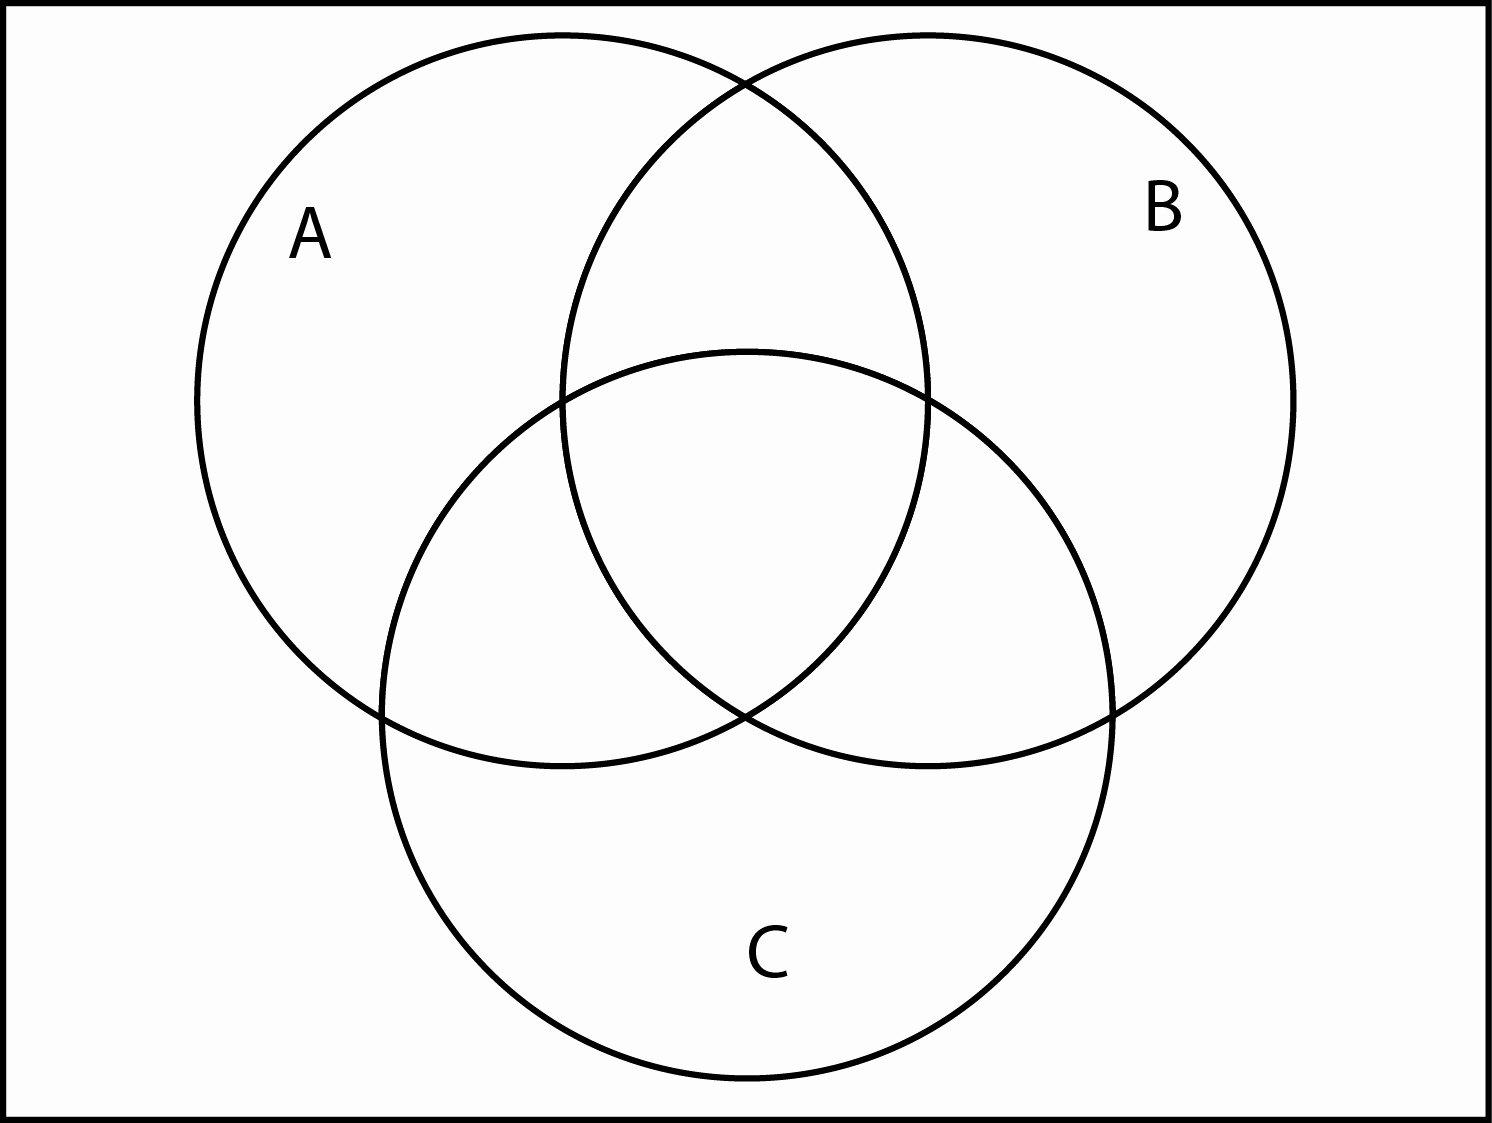 Venn Diagram Template Editable Awesome 3 Circle Venn Diagram Template 2018